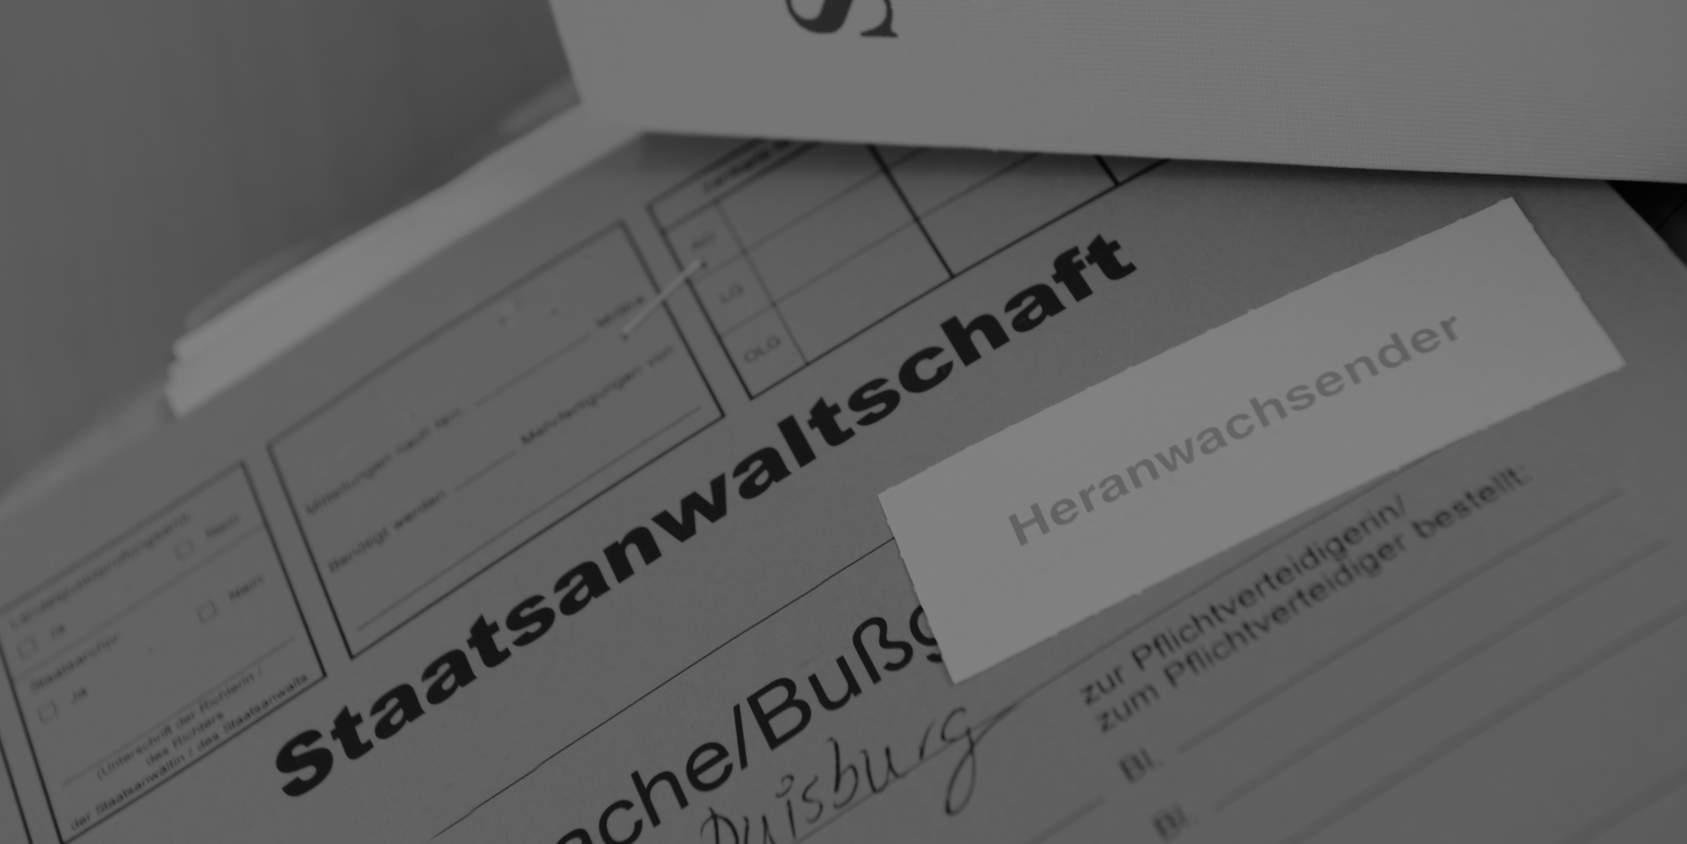 Strafverteidiger Isselhorst